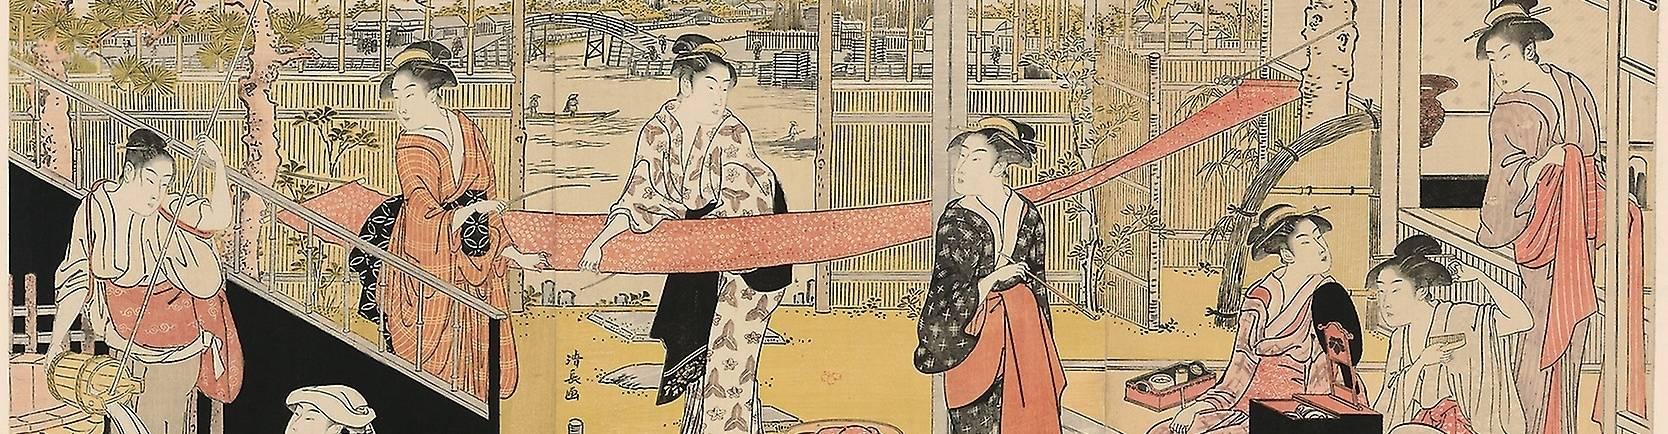 virmuze exhibit Innovation and Golden Age of Ukiyo-e logo main banner